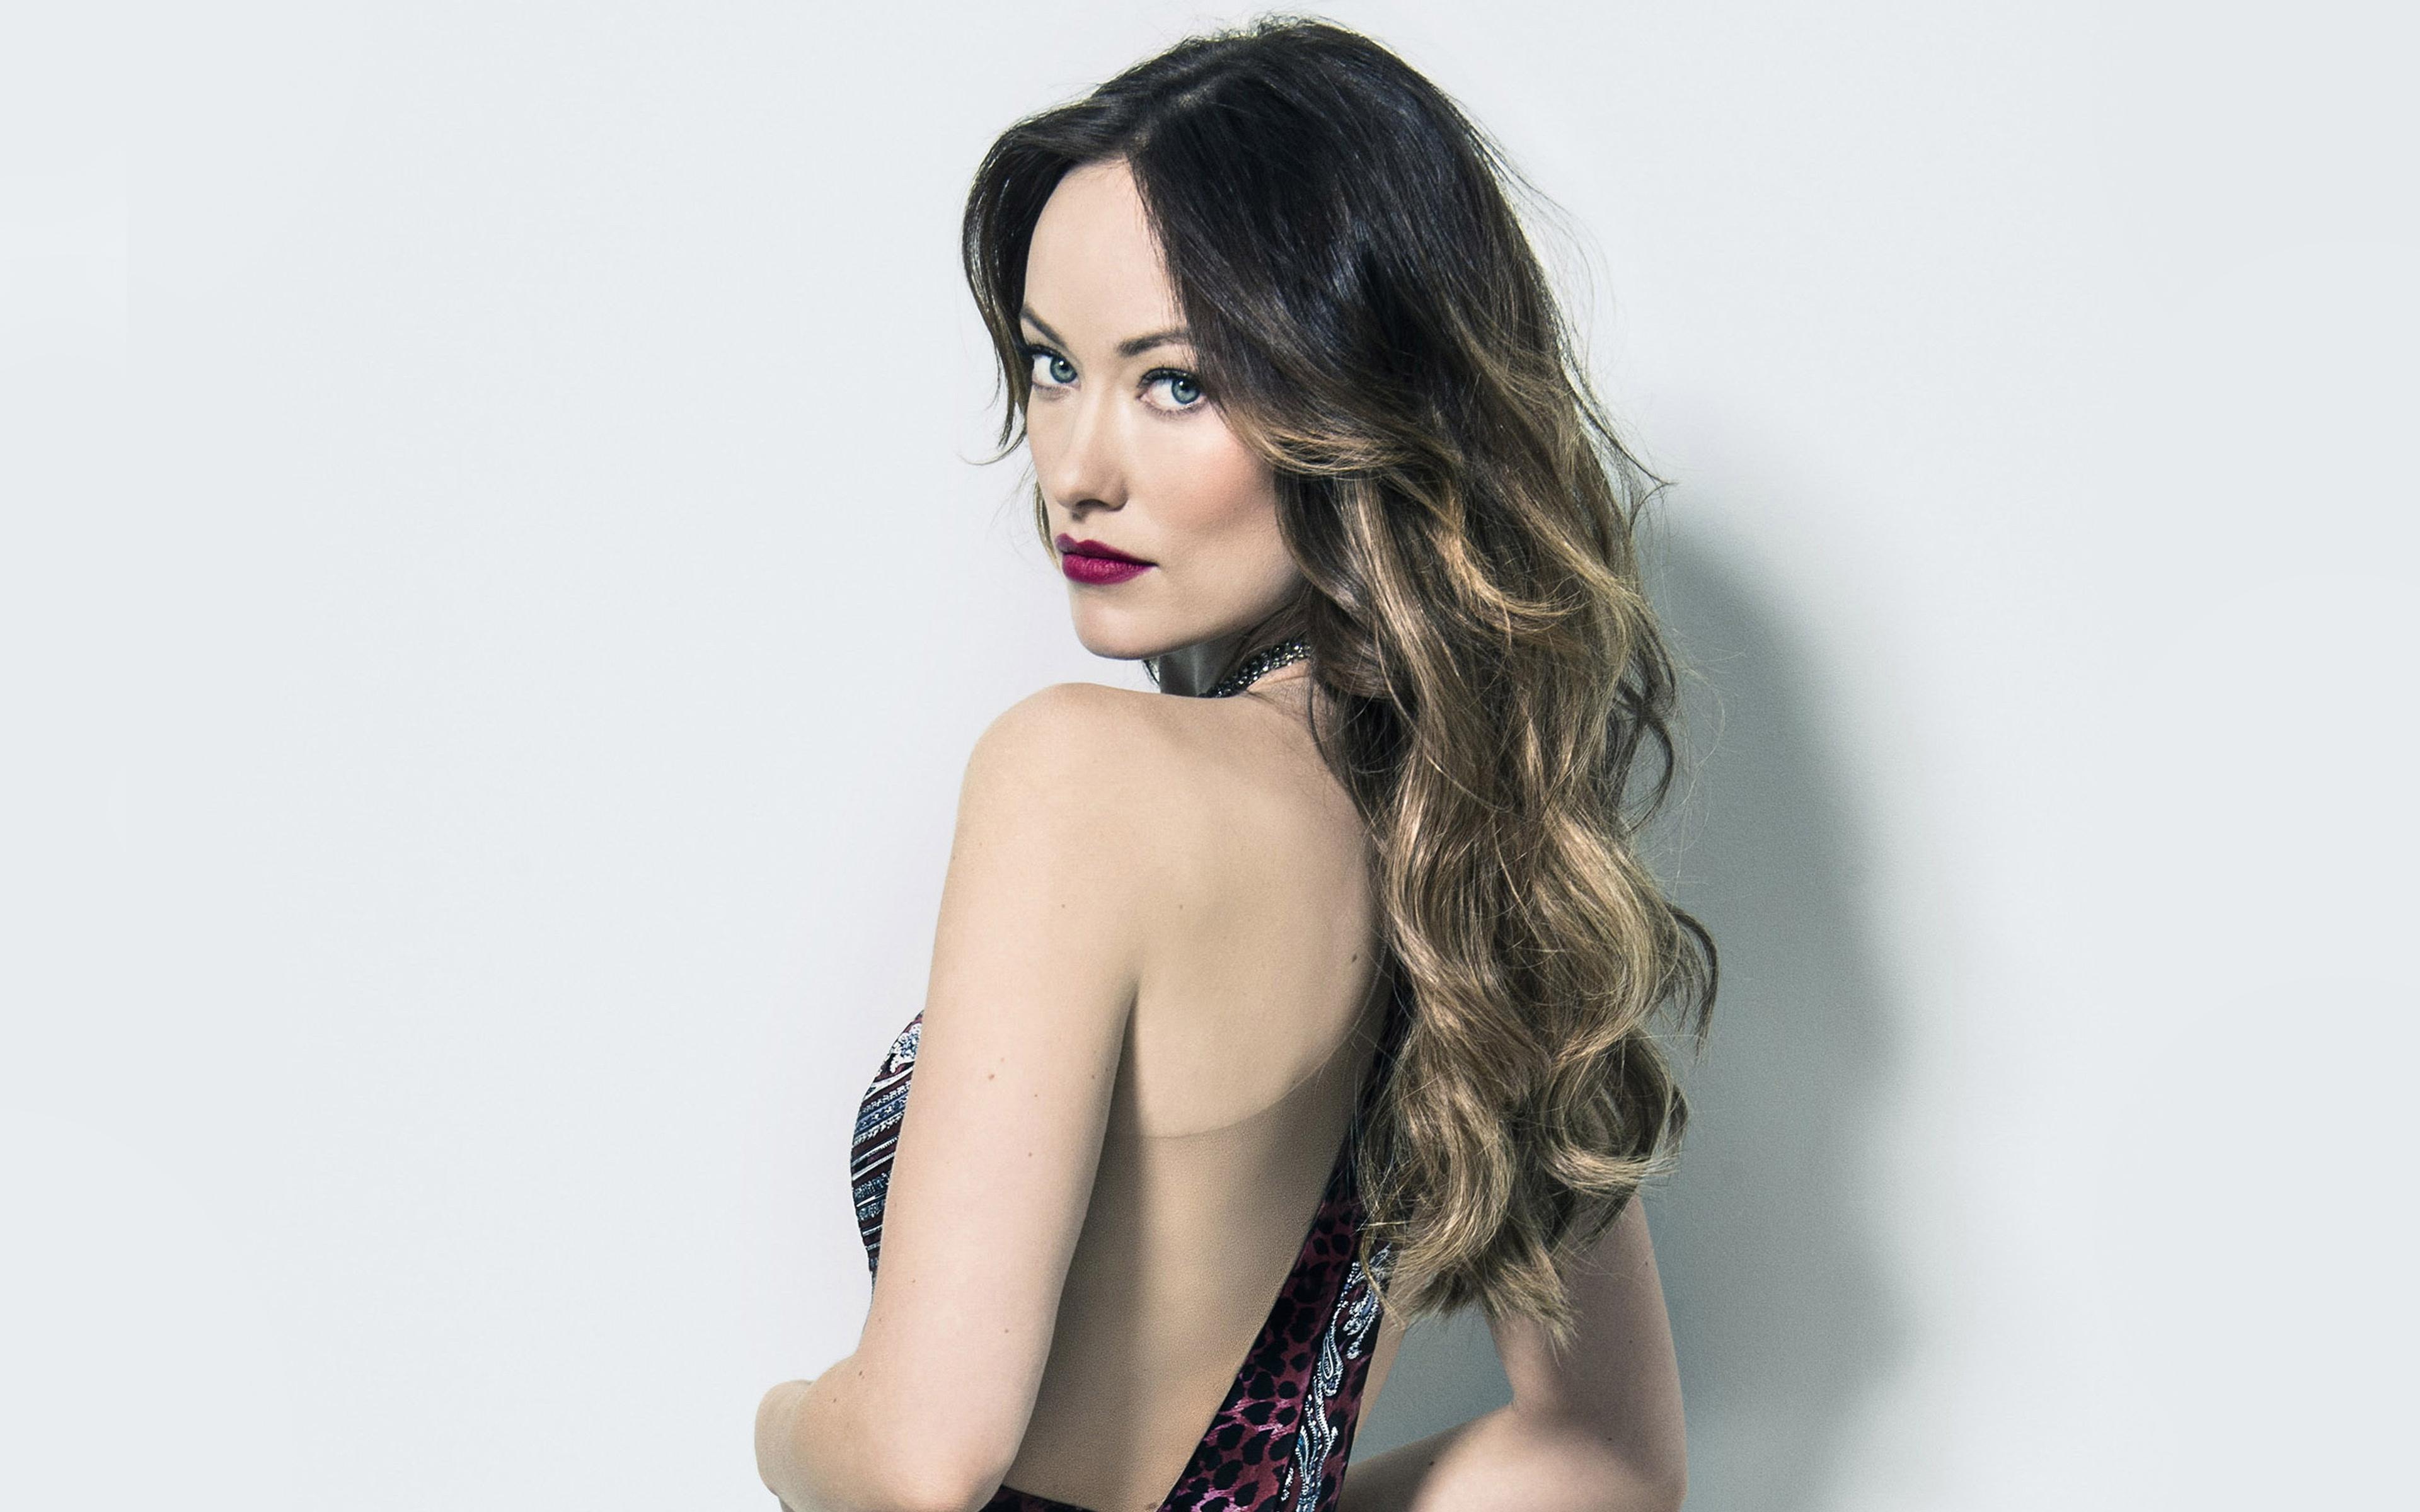 Olivia Wilde 4k Ultra Fondo De Pantalla Hd Fondo De